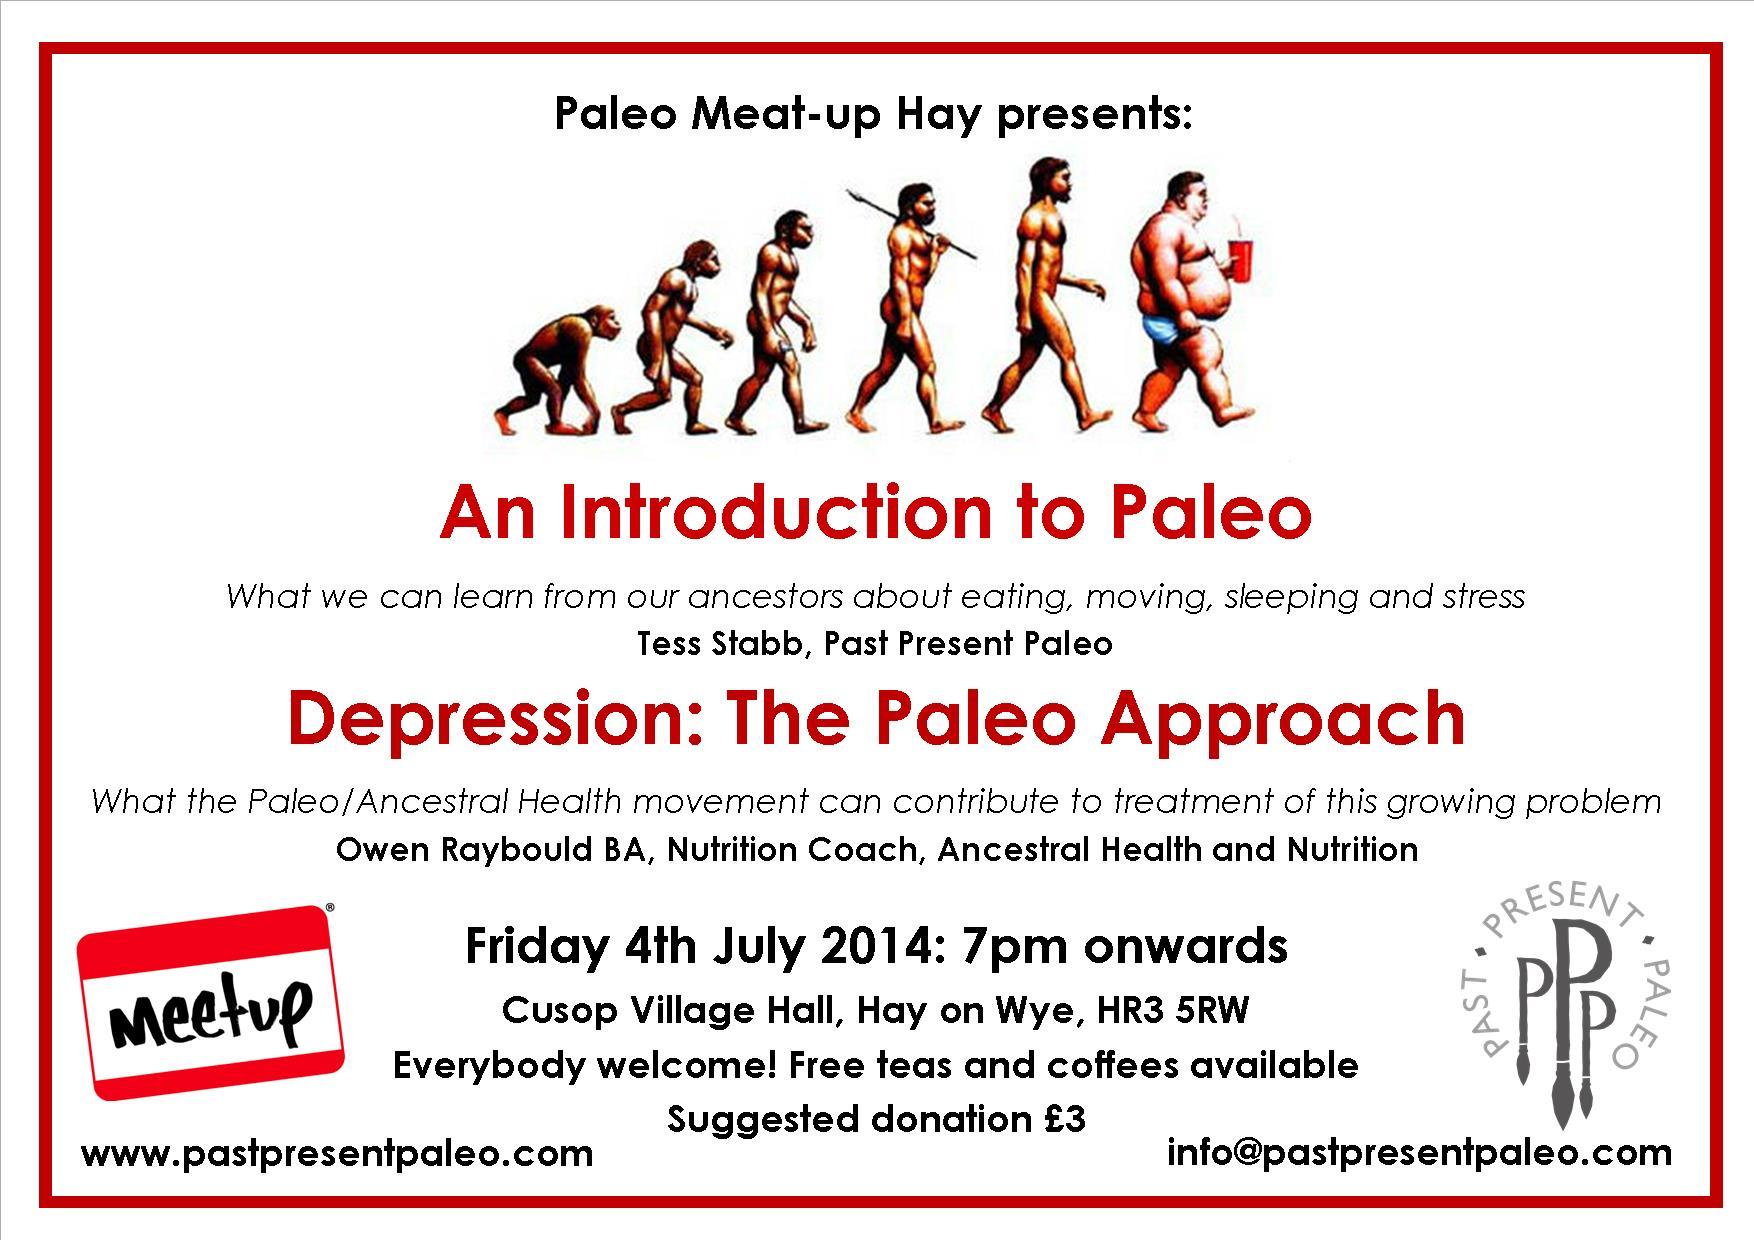 Paleo Meat-up Hay: July